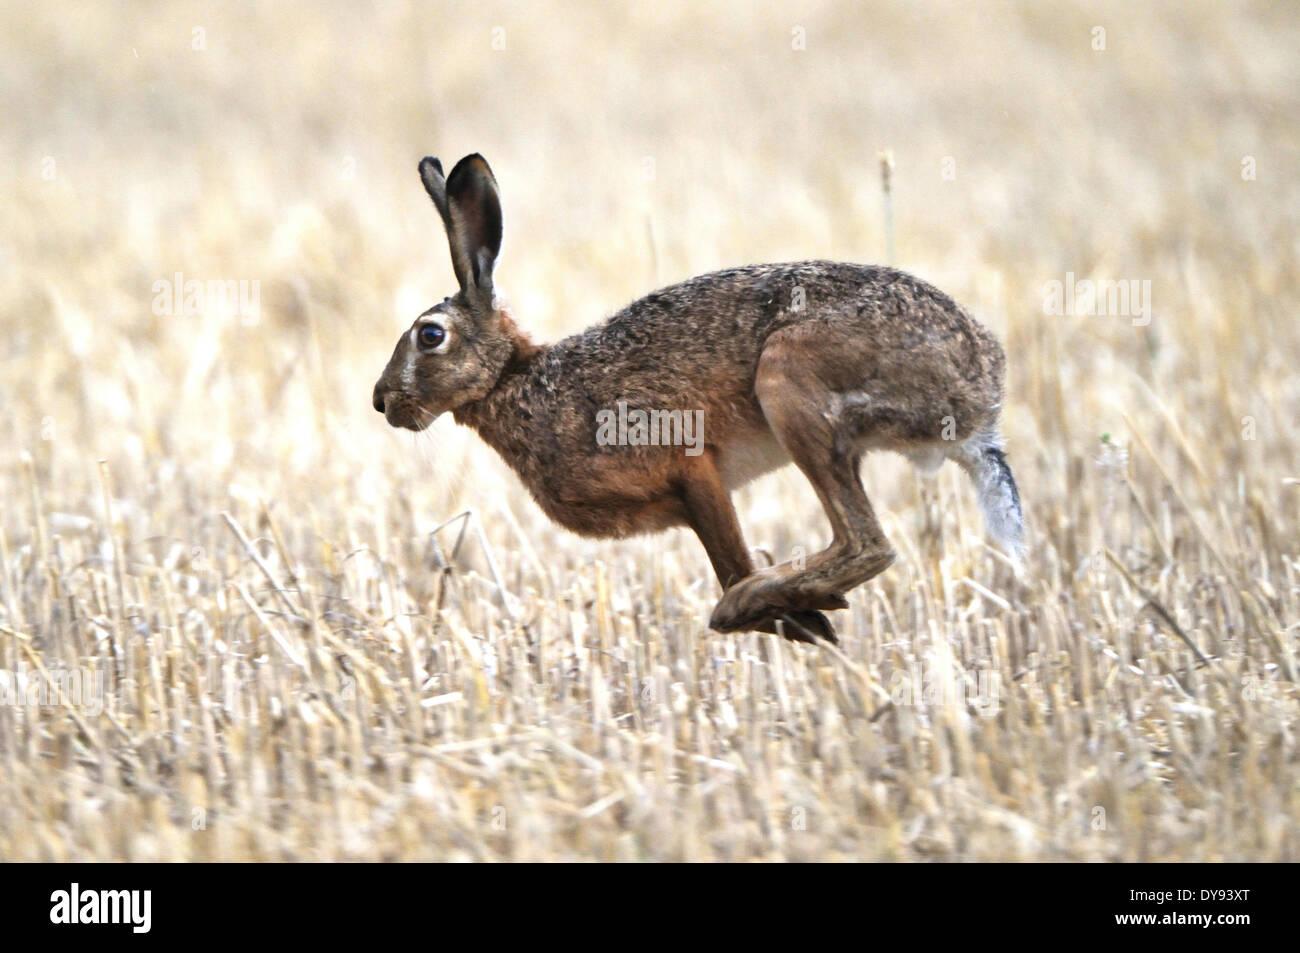 Hare Rabbit Lepus europaeus Pallas hares rabbits field hares field hare bunny lamp stubble field summer flee animal animals, - Stock Image